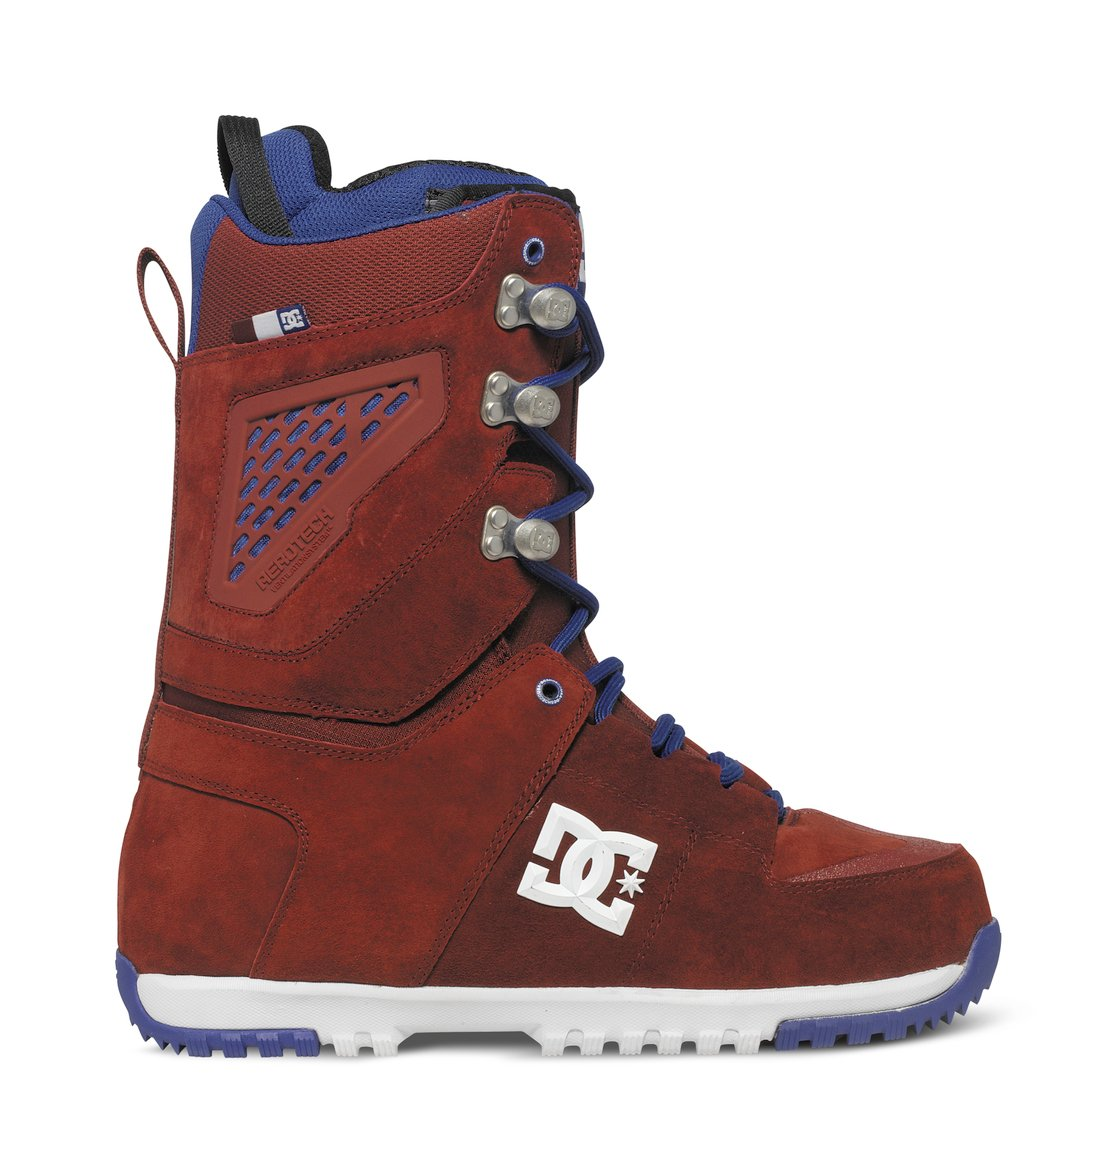 Lynx Snow - Dcshoes - Dcshoes������� ��������������� ������� Lynx Snow �� ��������������� ��������� DC Shoes. ��������������: ������������ ��������, ���������� ���������� ������� UniLite, ���������� ����� Black, ������� Impact S, ���� ������� � ������ �������.<br>